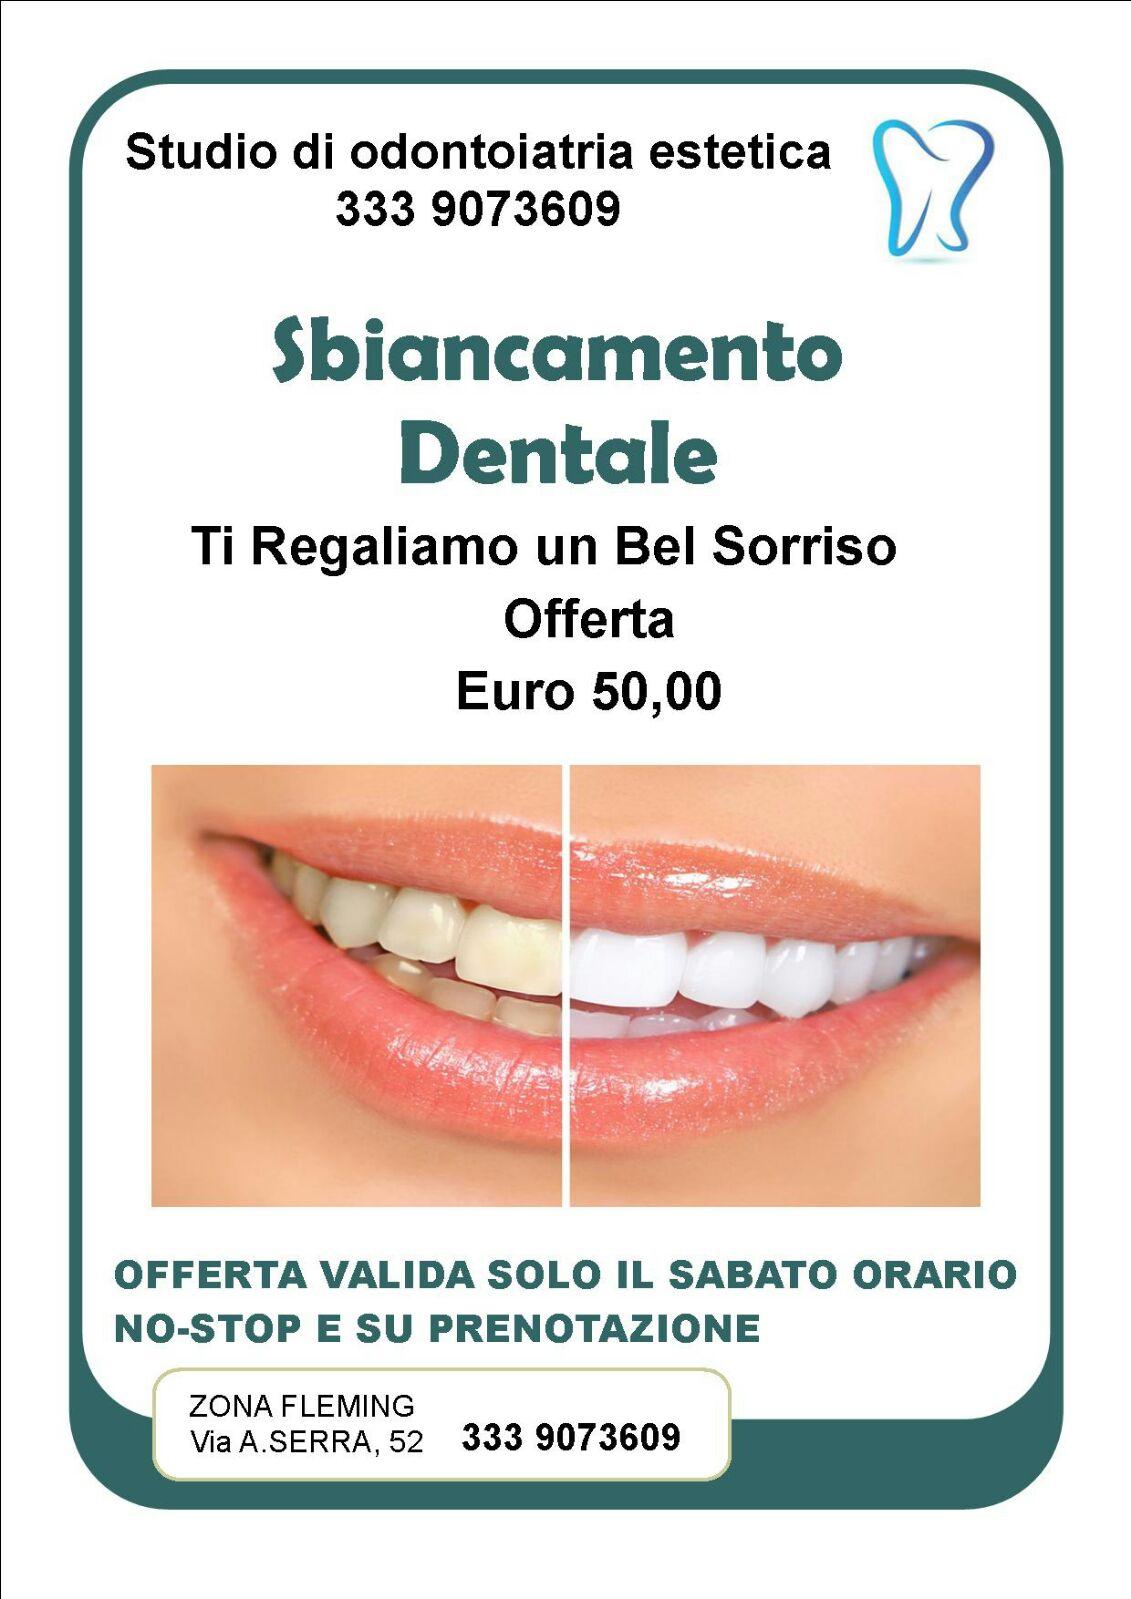 Studio Odontoiatria Estetica – Promo CGR